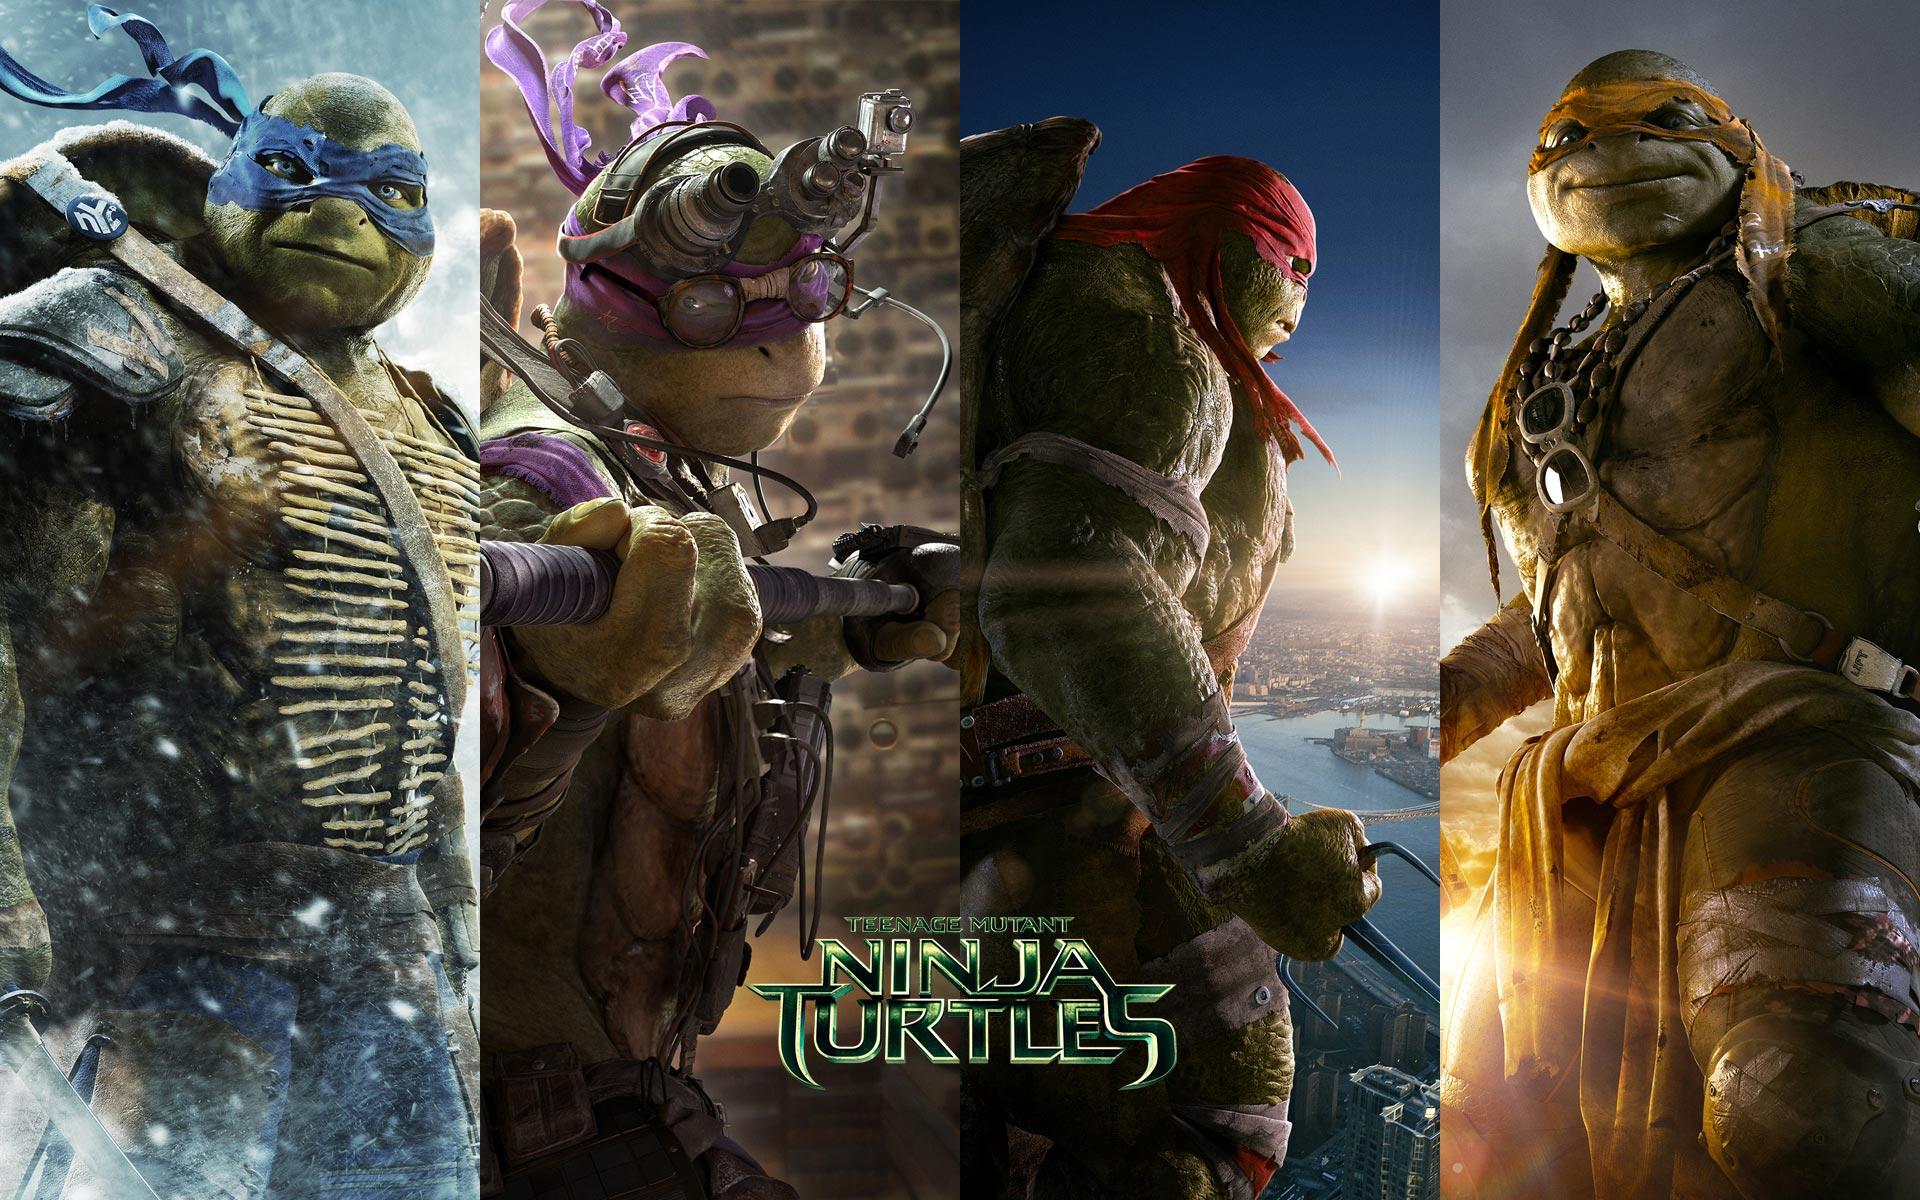 Mutant Ninja Turtles TMNT 2014 HD Desktop iPhone iPad Wallpapers 1920x1200